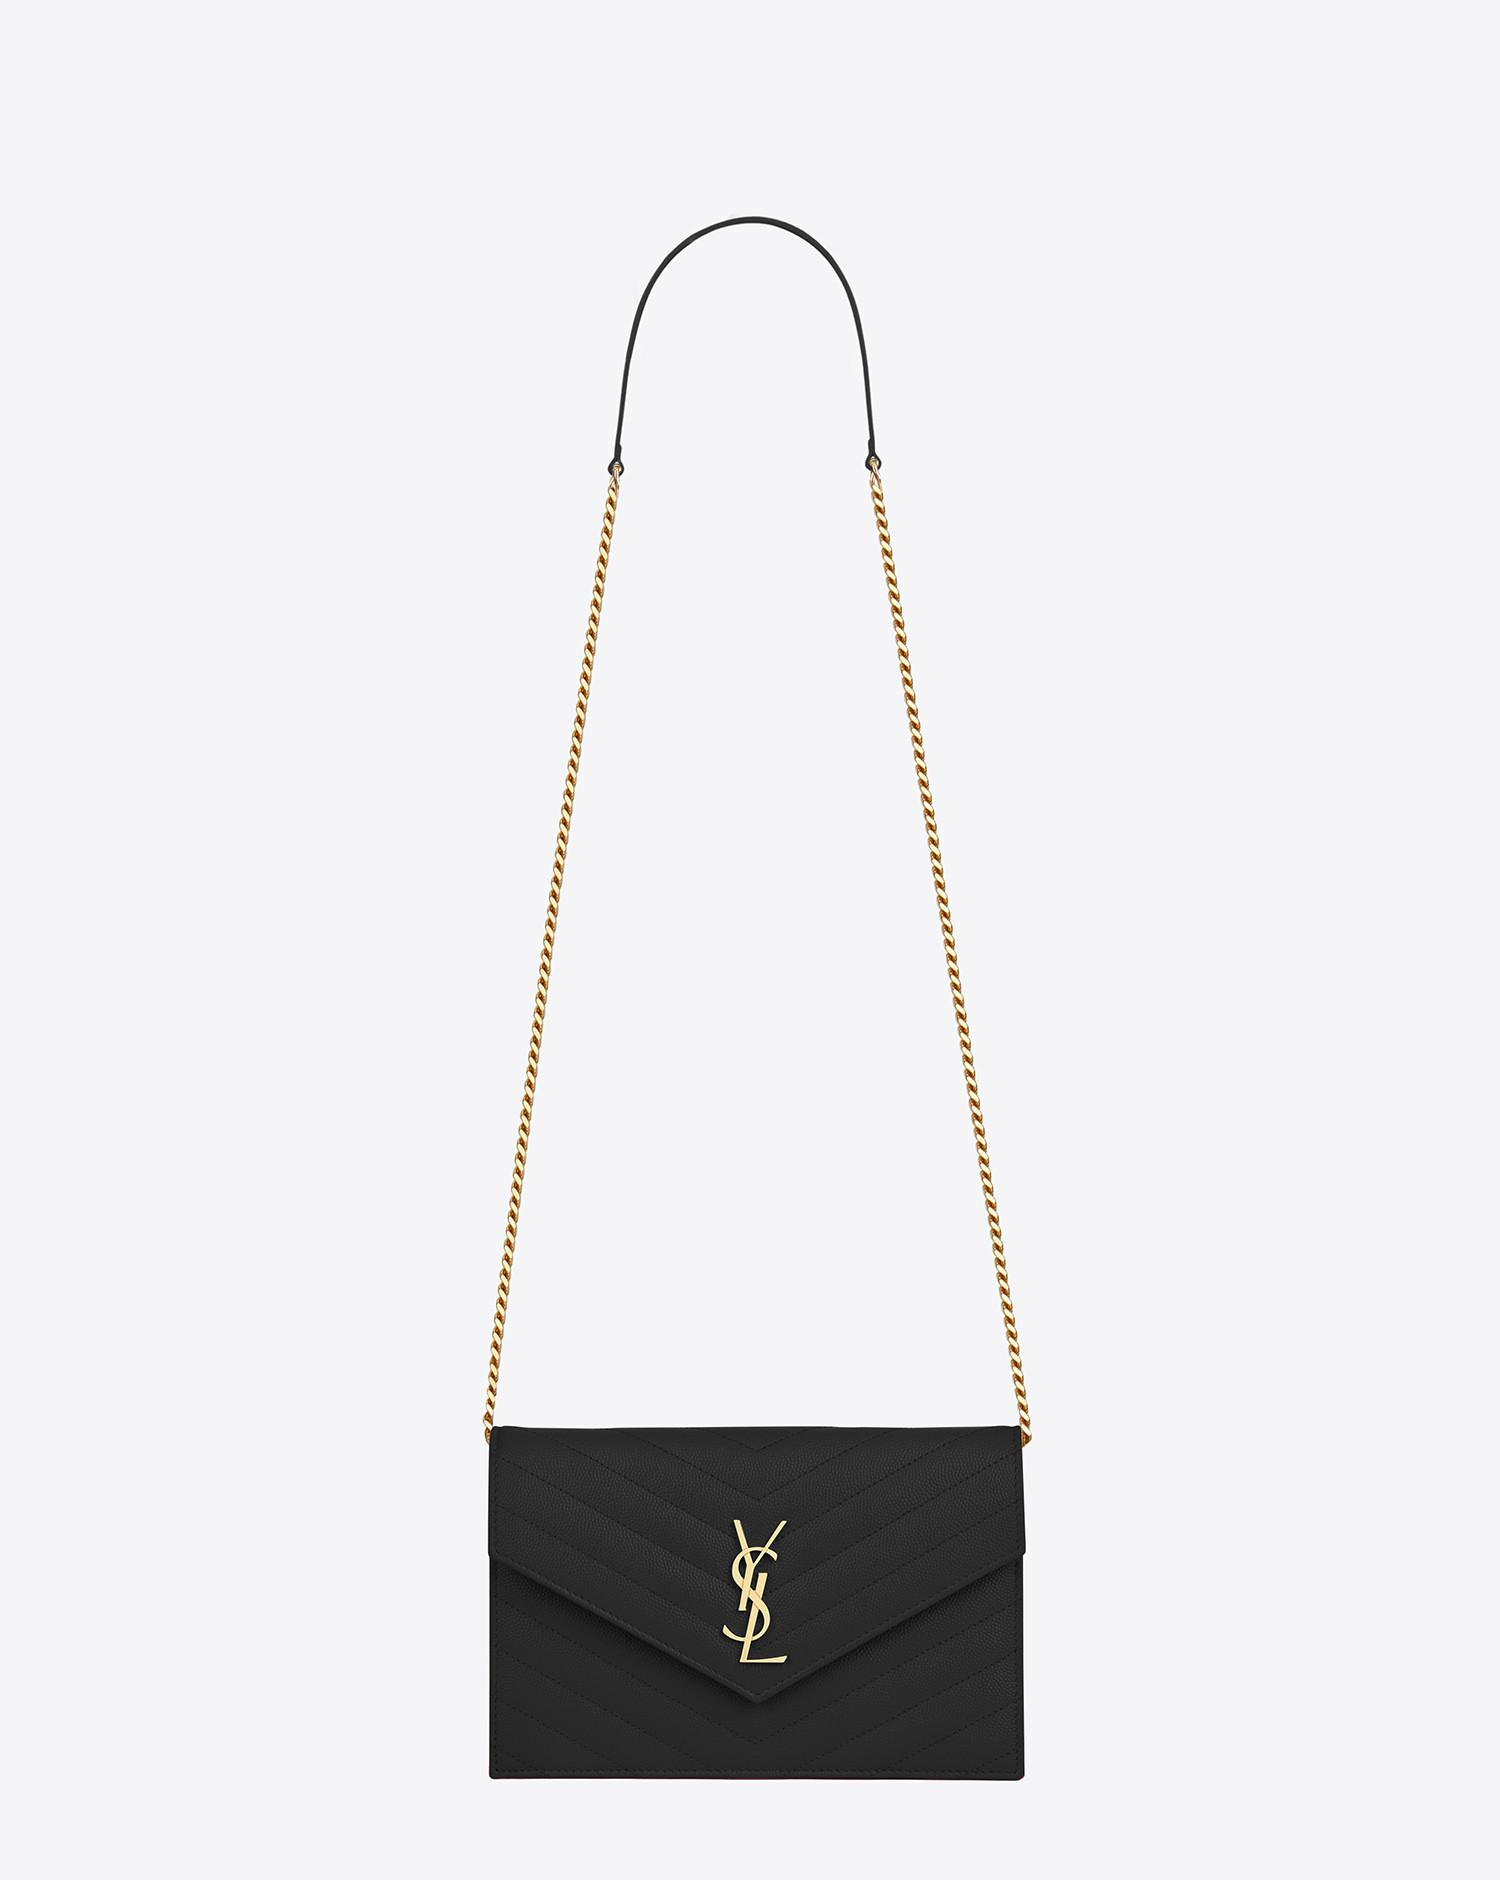 46fe182e686 Gallery. Women s Wallet On Chain Women s Fossil Kinley Women s Perforated  Leather Handbags Women s Saint Laurent ...